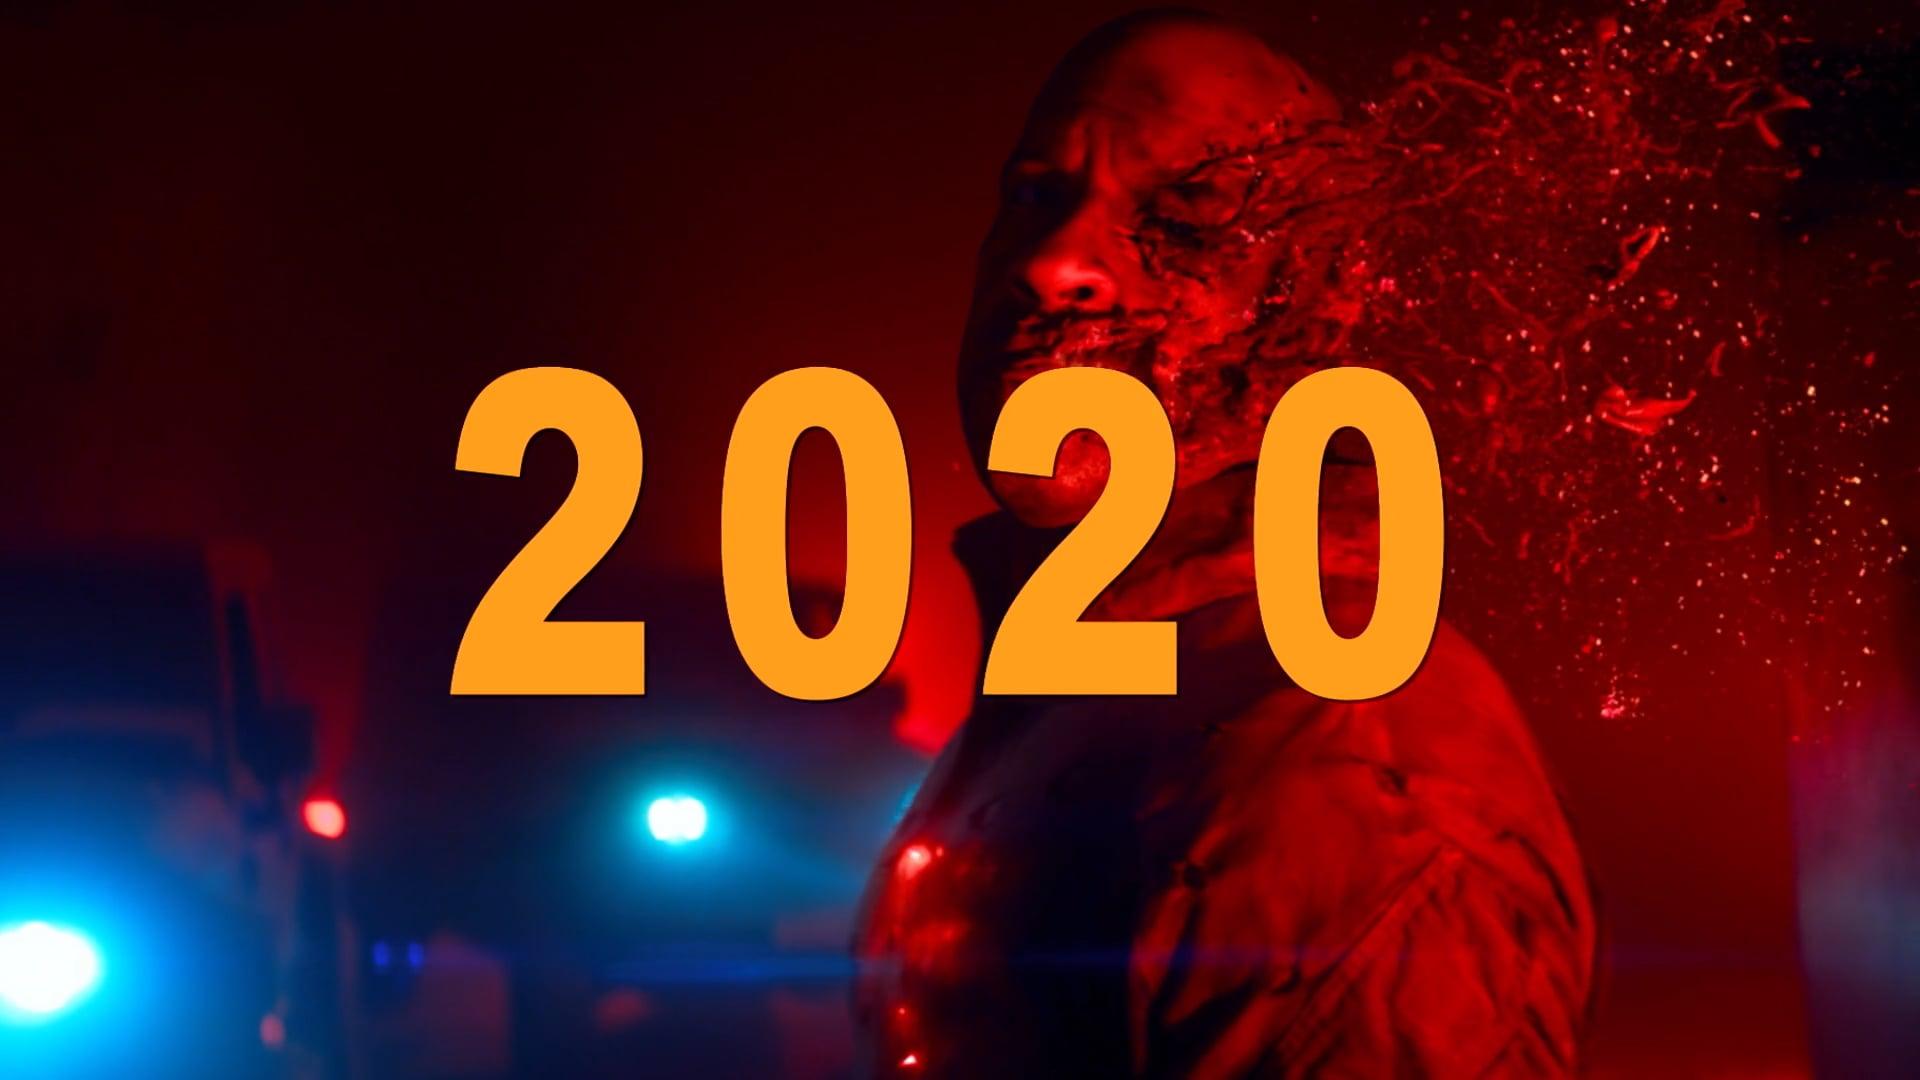 JUMP! CREATIVE 2020 SIZZLE